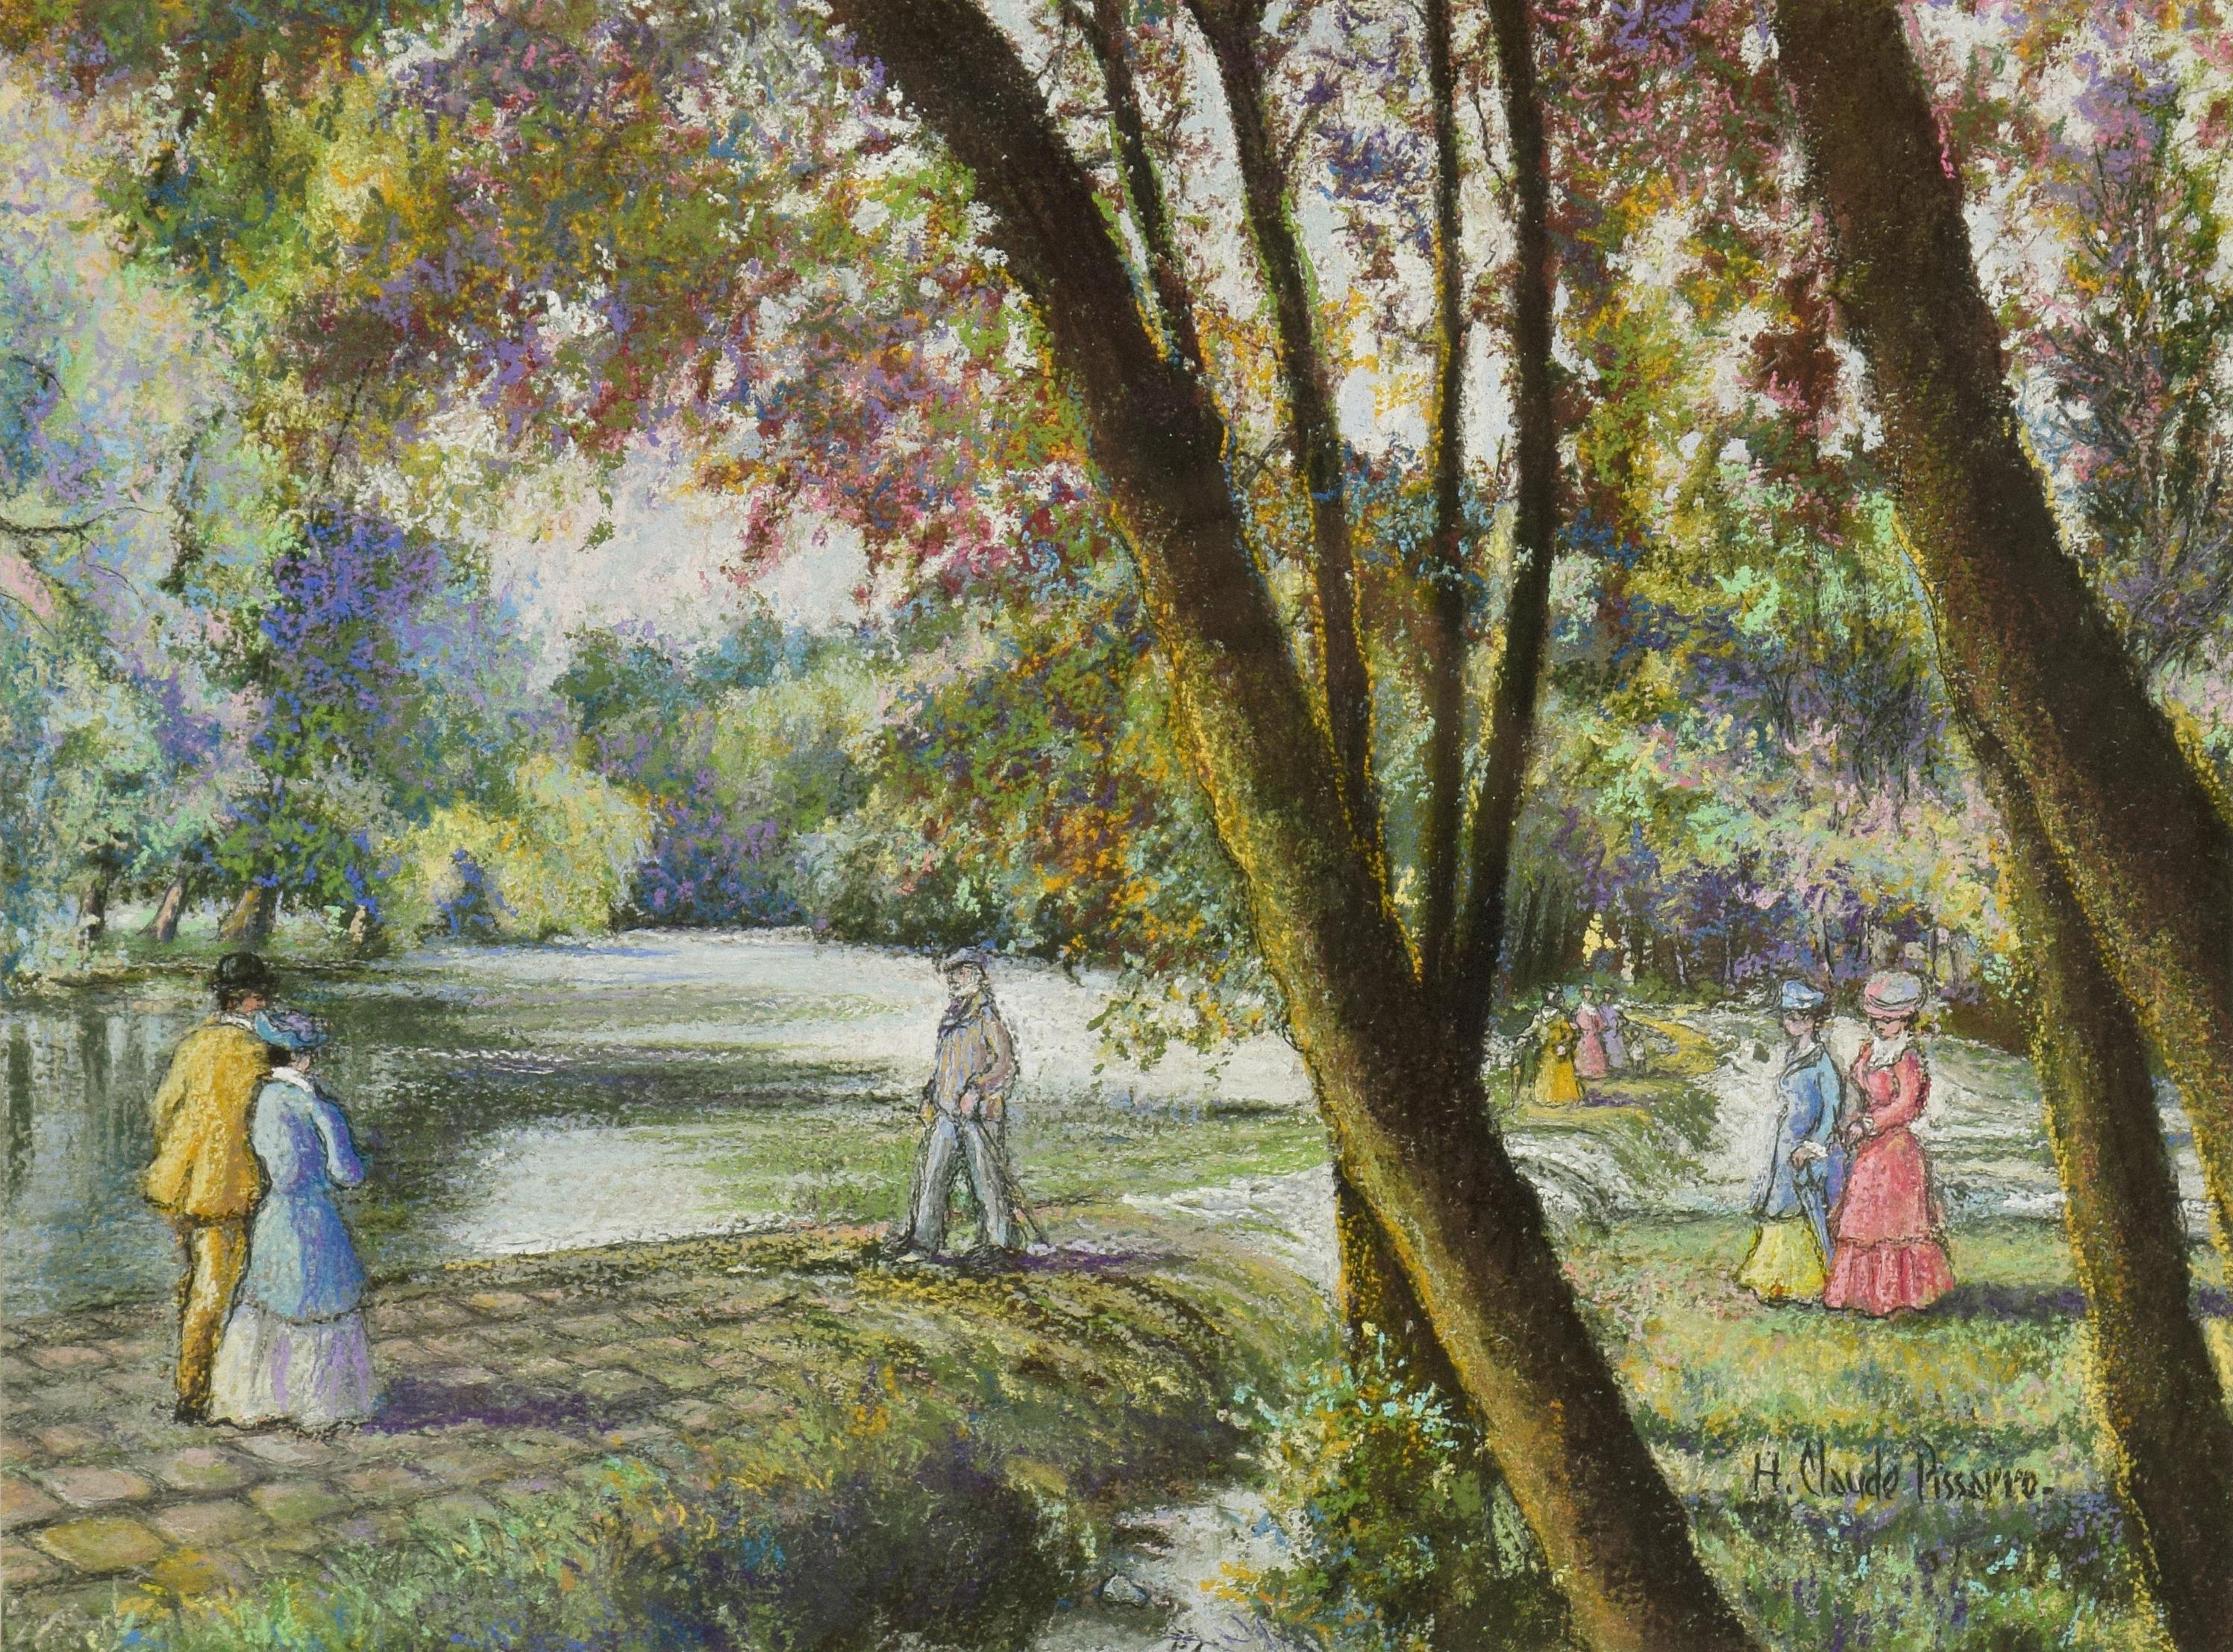 Le Barrage du Vey (Clécy) by H. Claude Pissarro - Post Impressionist style